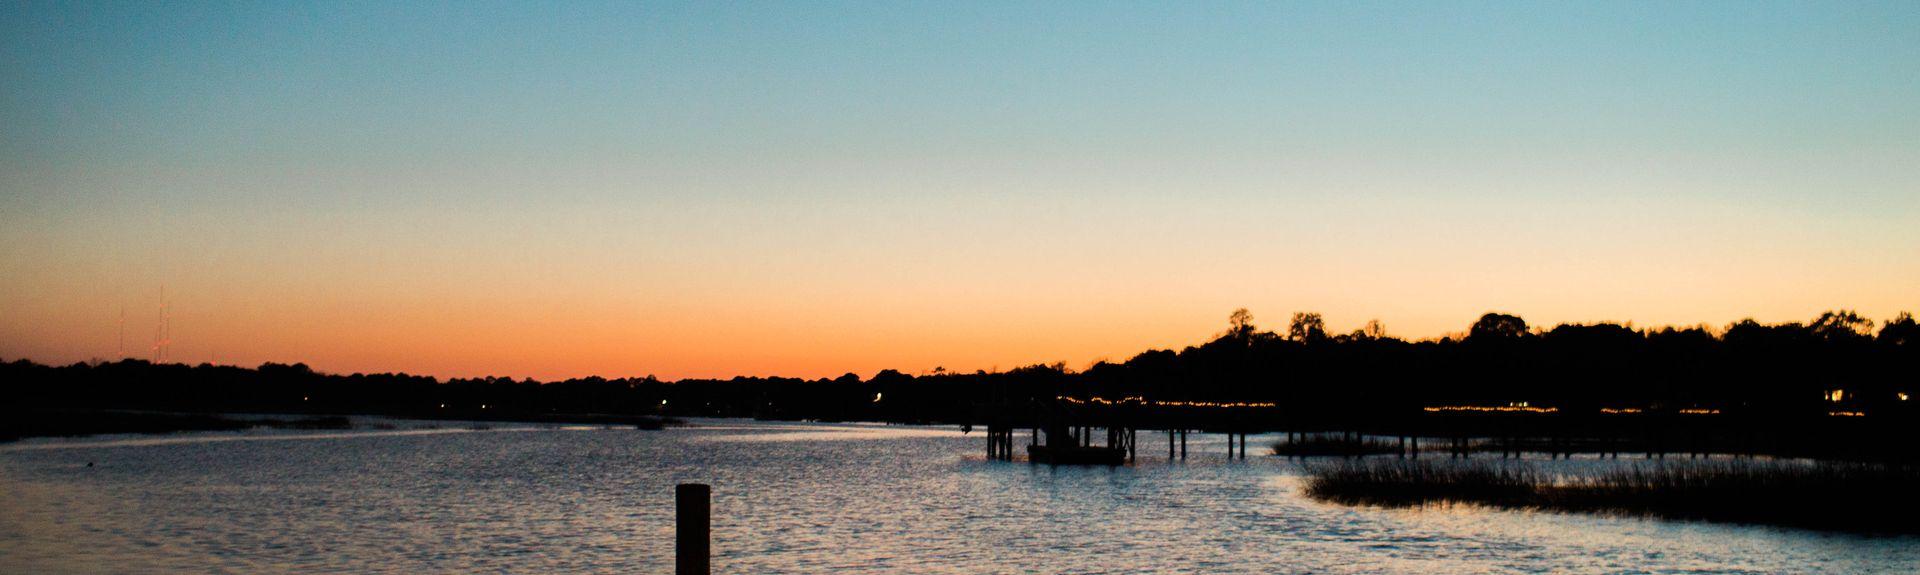 Daniel Island, Charleston, SC, USA